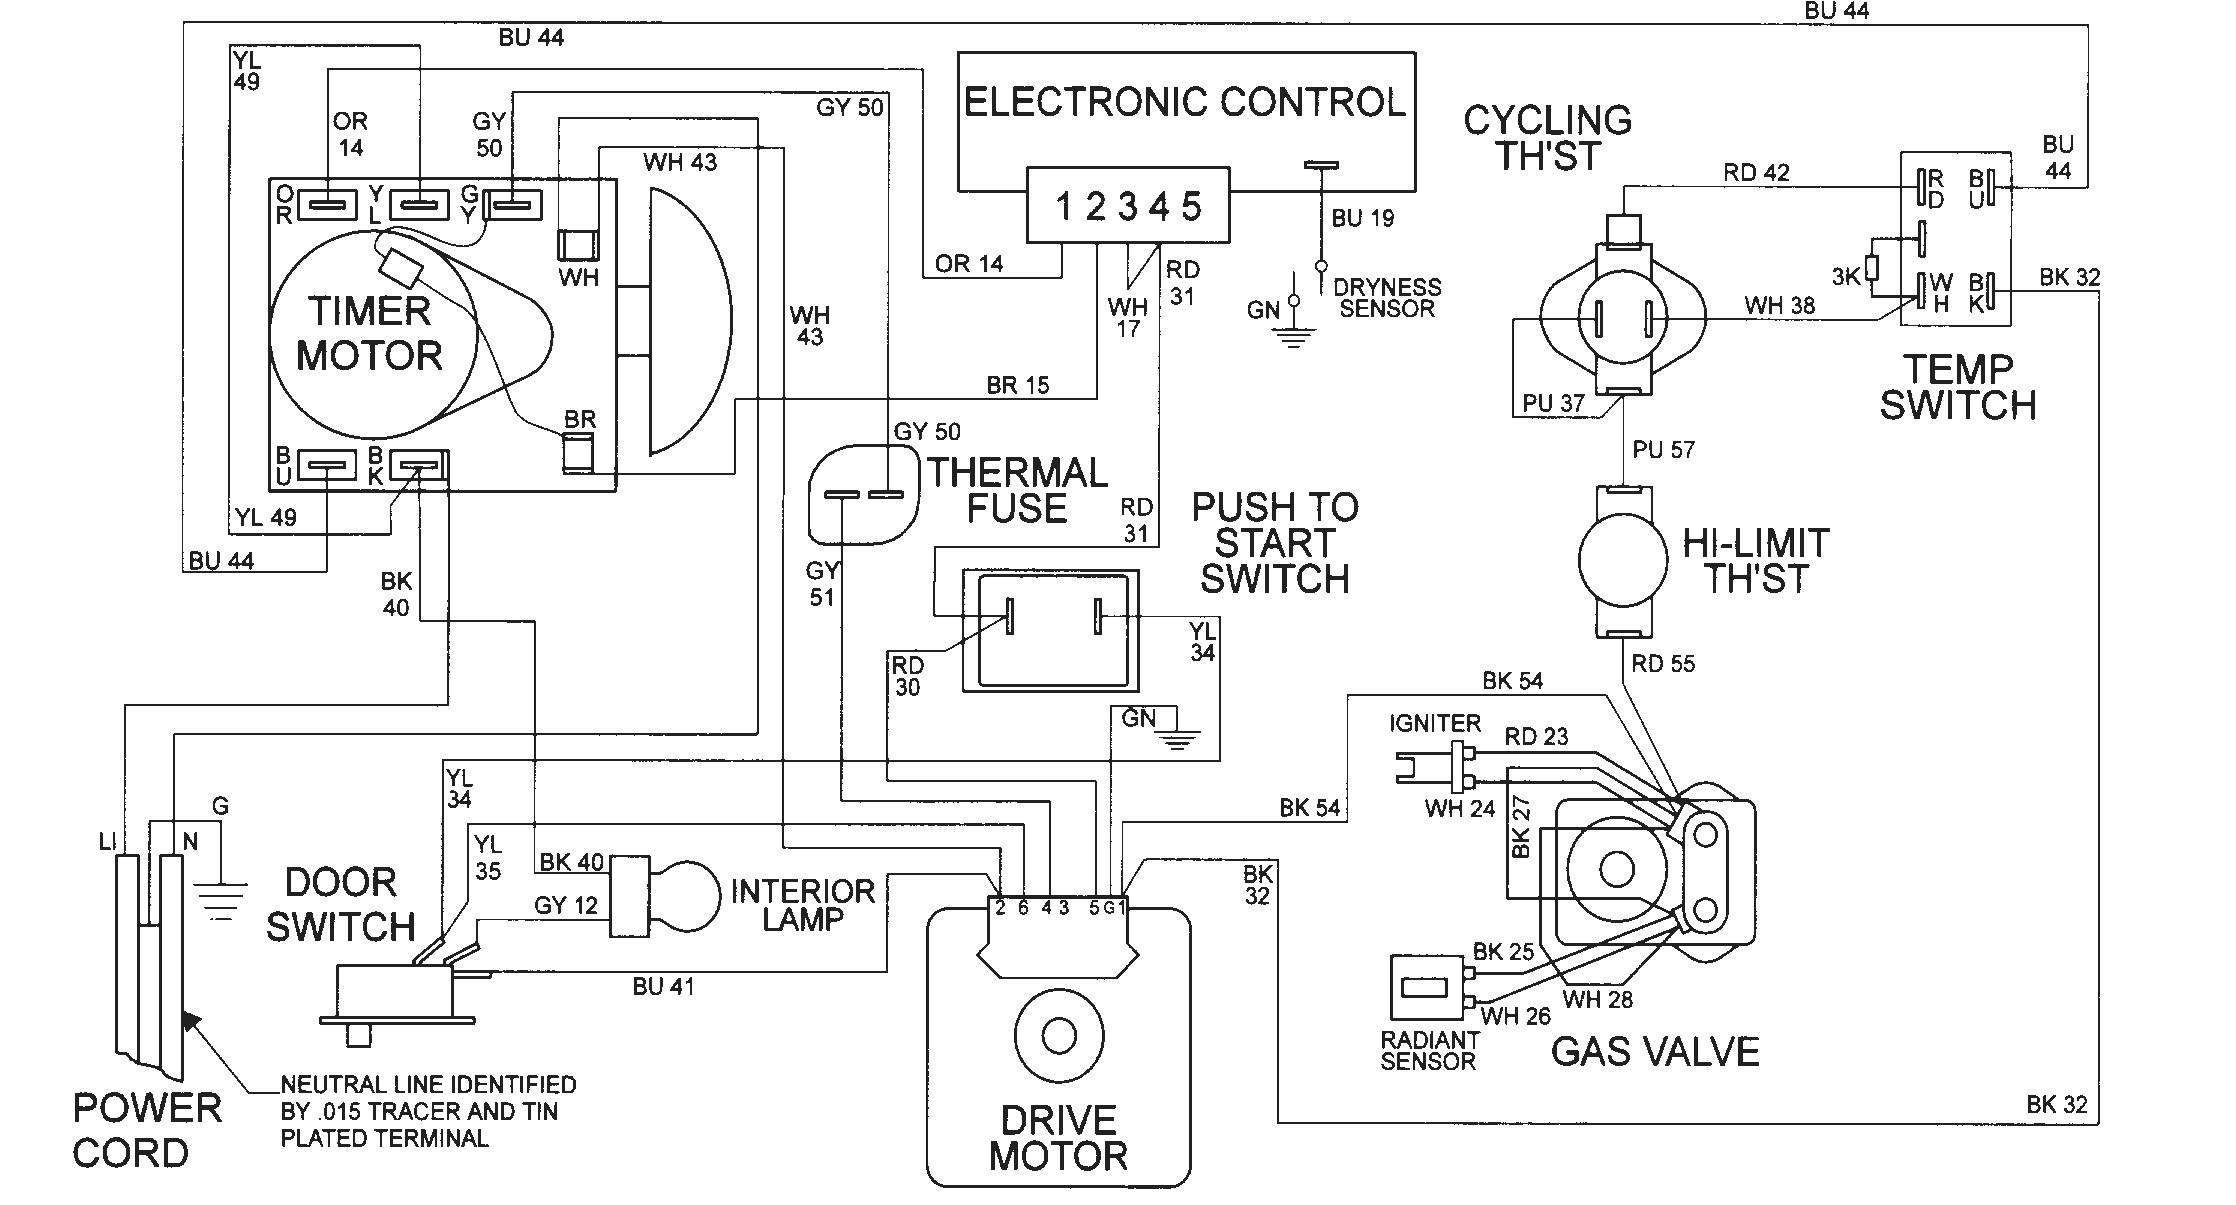 Maytag Centennial Washer Wiring Diagram | Switch Wiring Diagram Free - Maytag Dryer Wiring Diagram